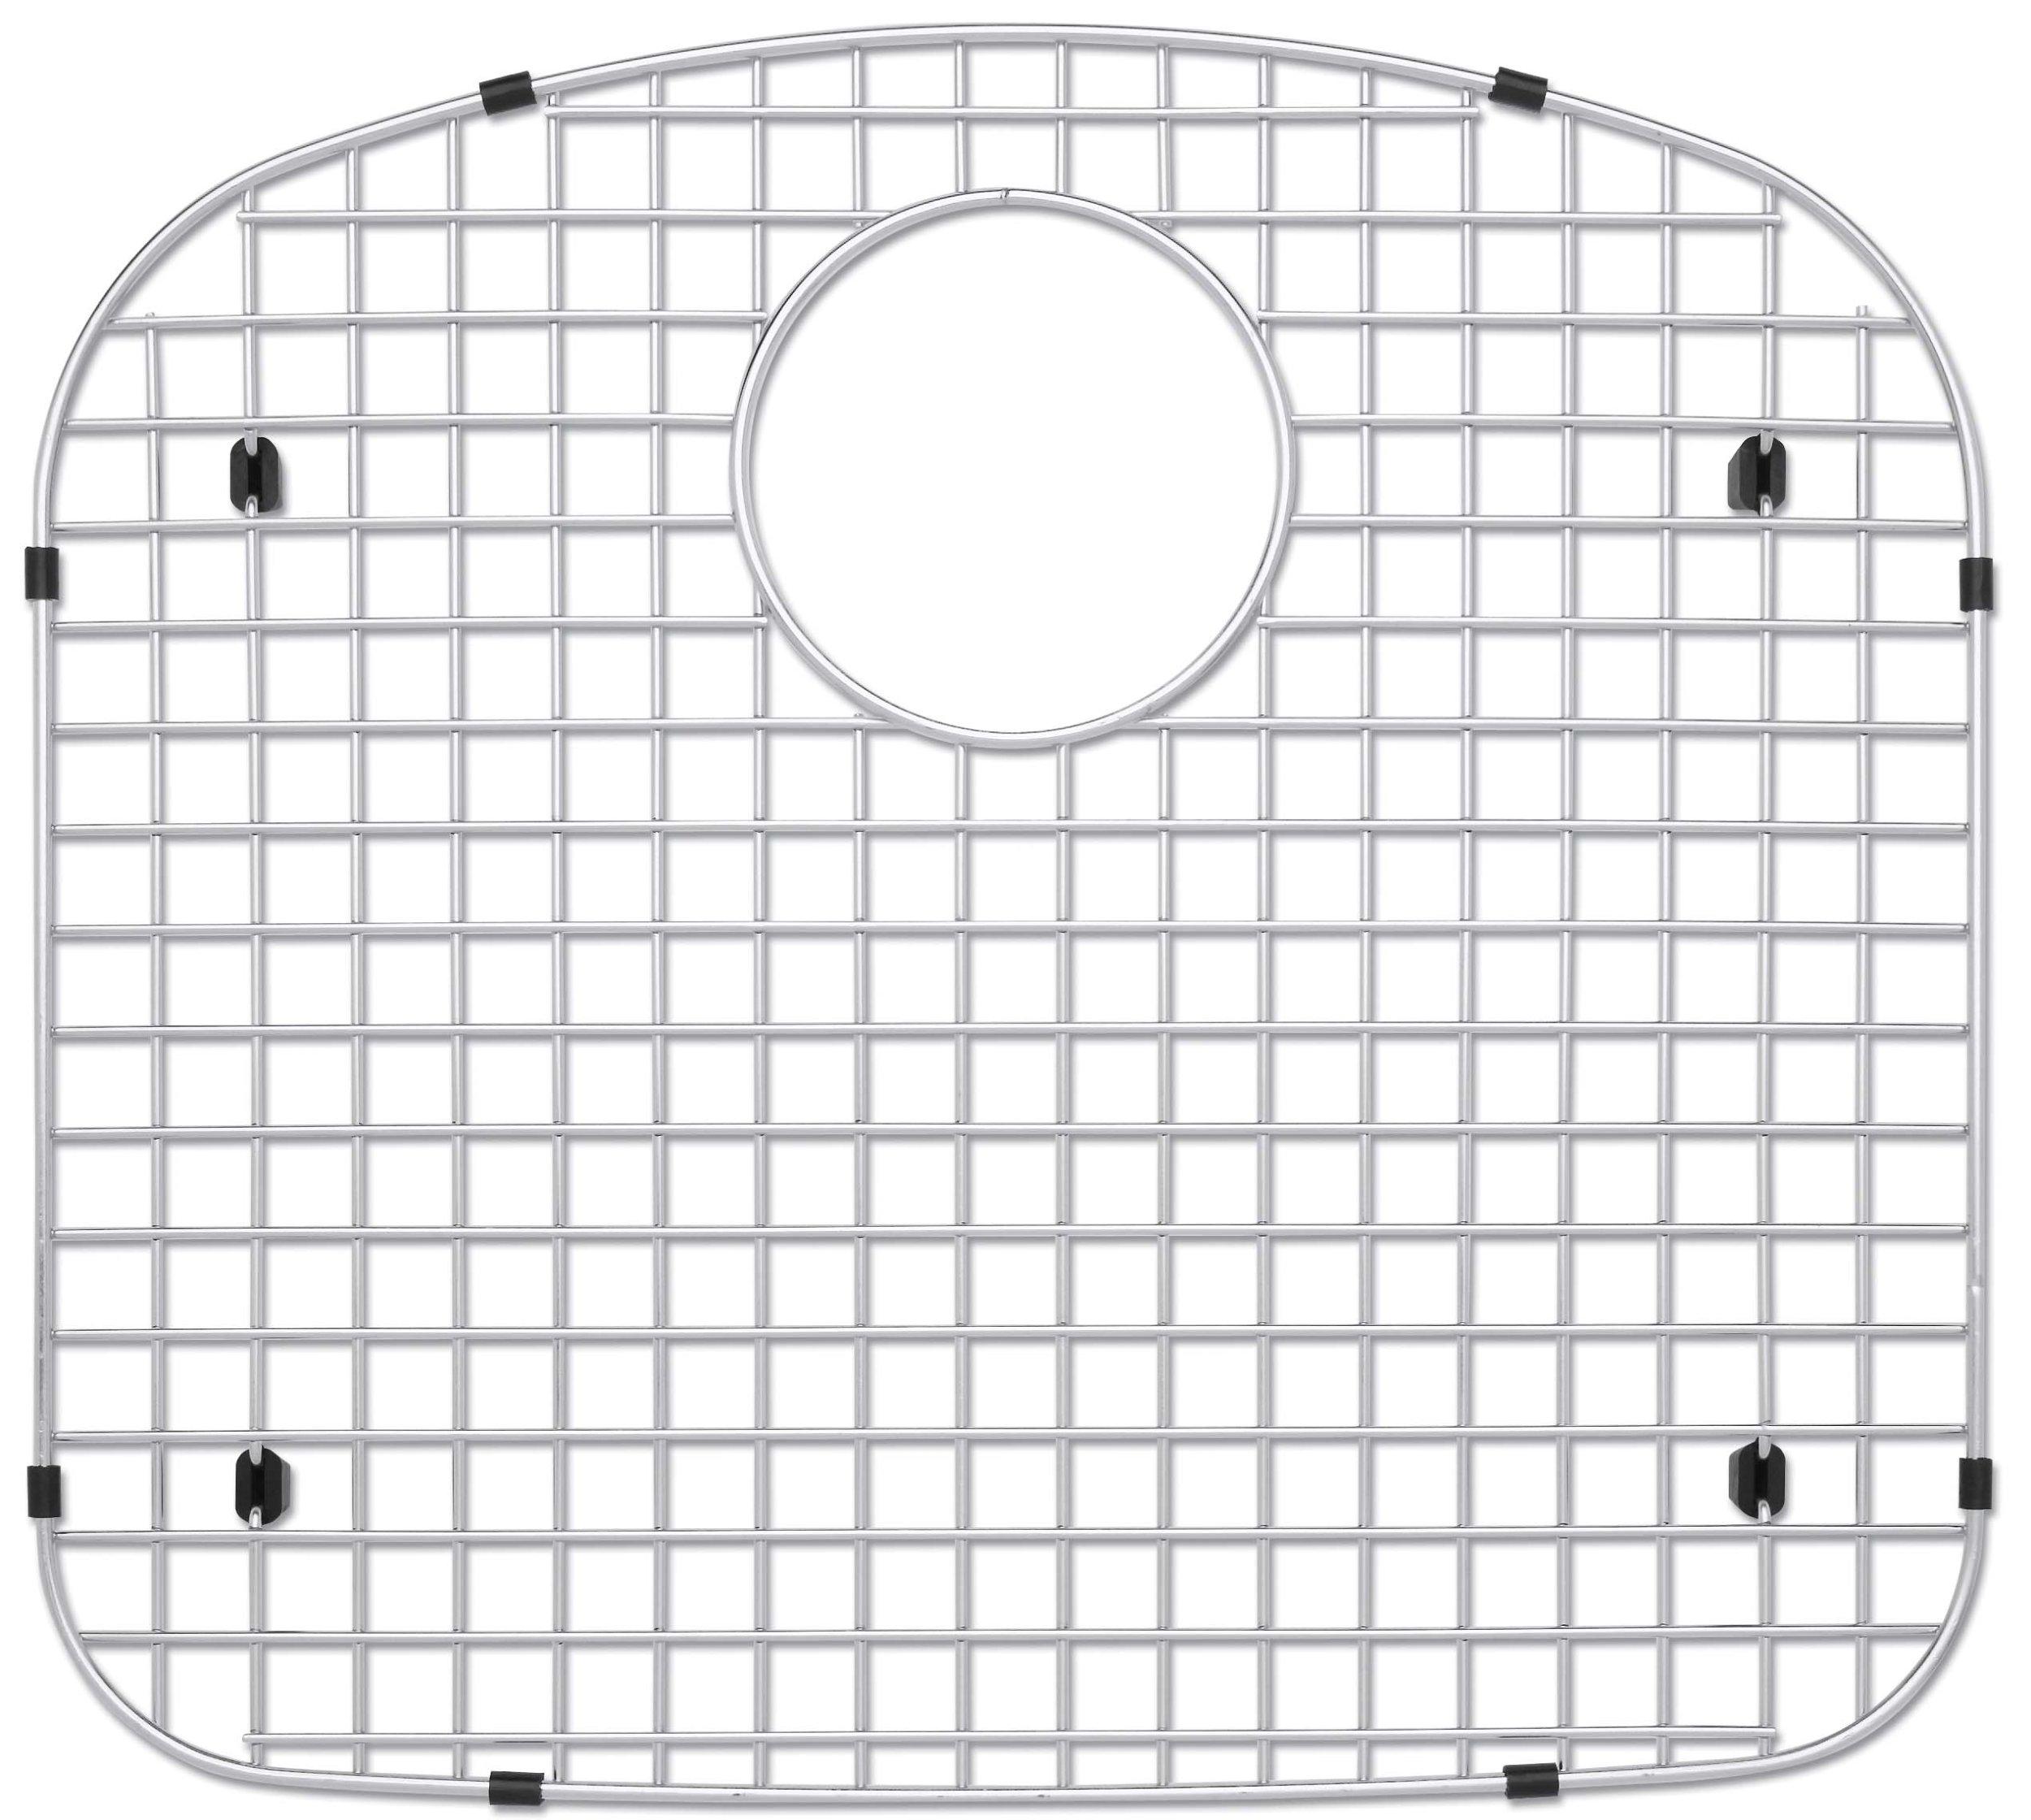 Blanco 220-992 Stainless Steel Sink Grid by Blanco